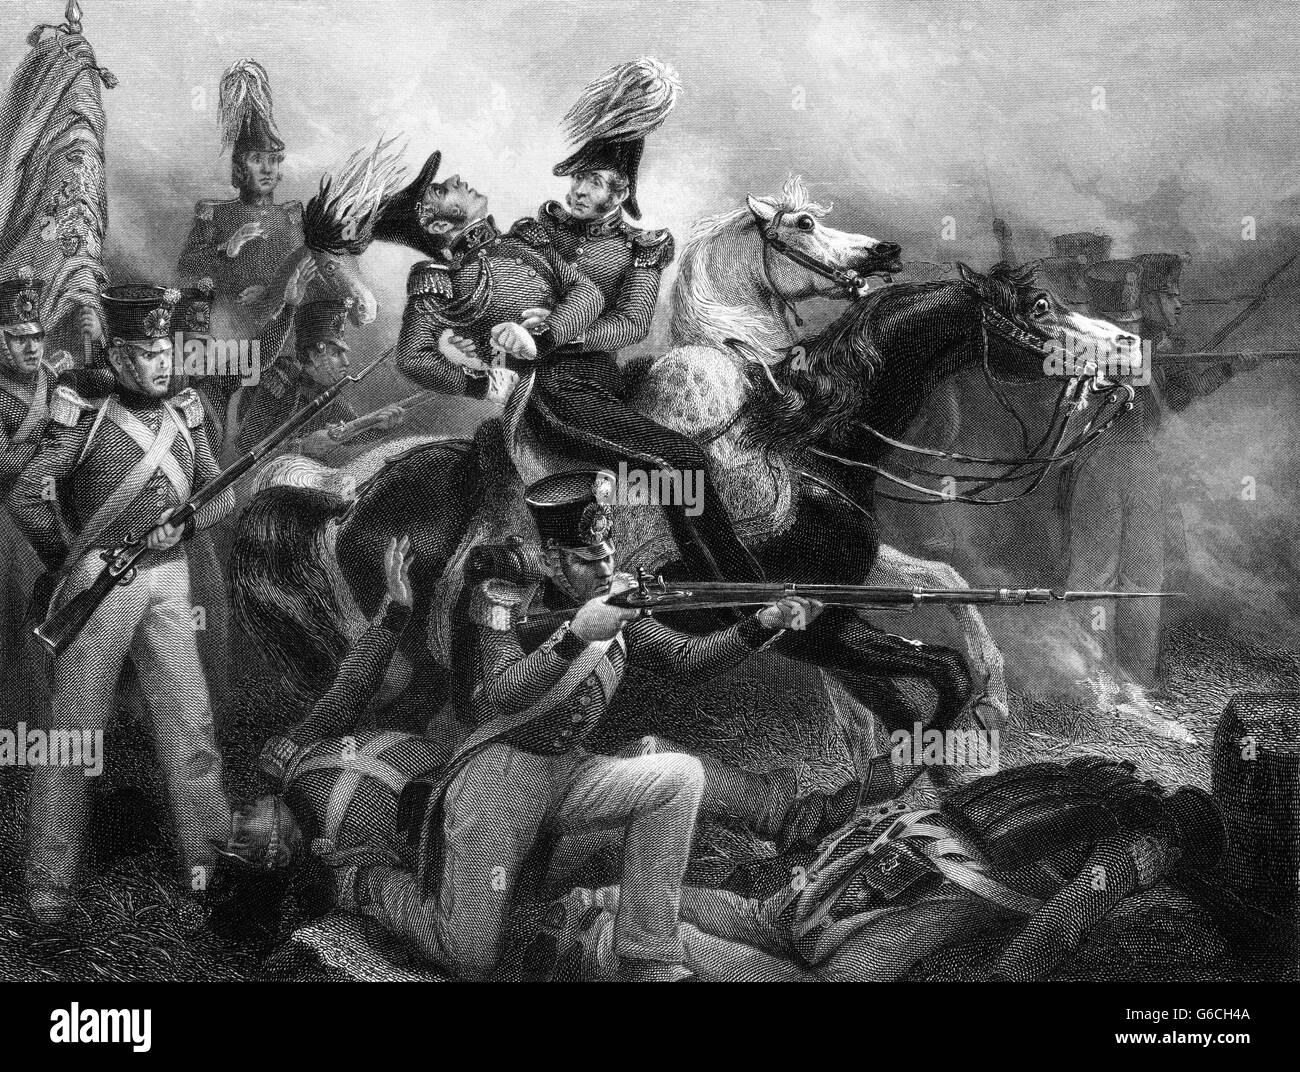 1810s DEATH OF GENERAL ROSS AT BALTIMORE ON HORSEBACK SEPTEMBER 1814 DURING WAR OF 1812 BRITISH TROOPS - Stock Image